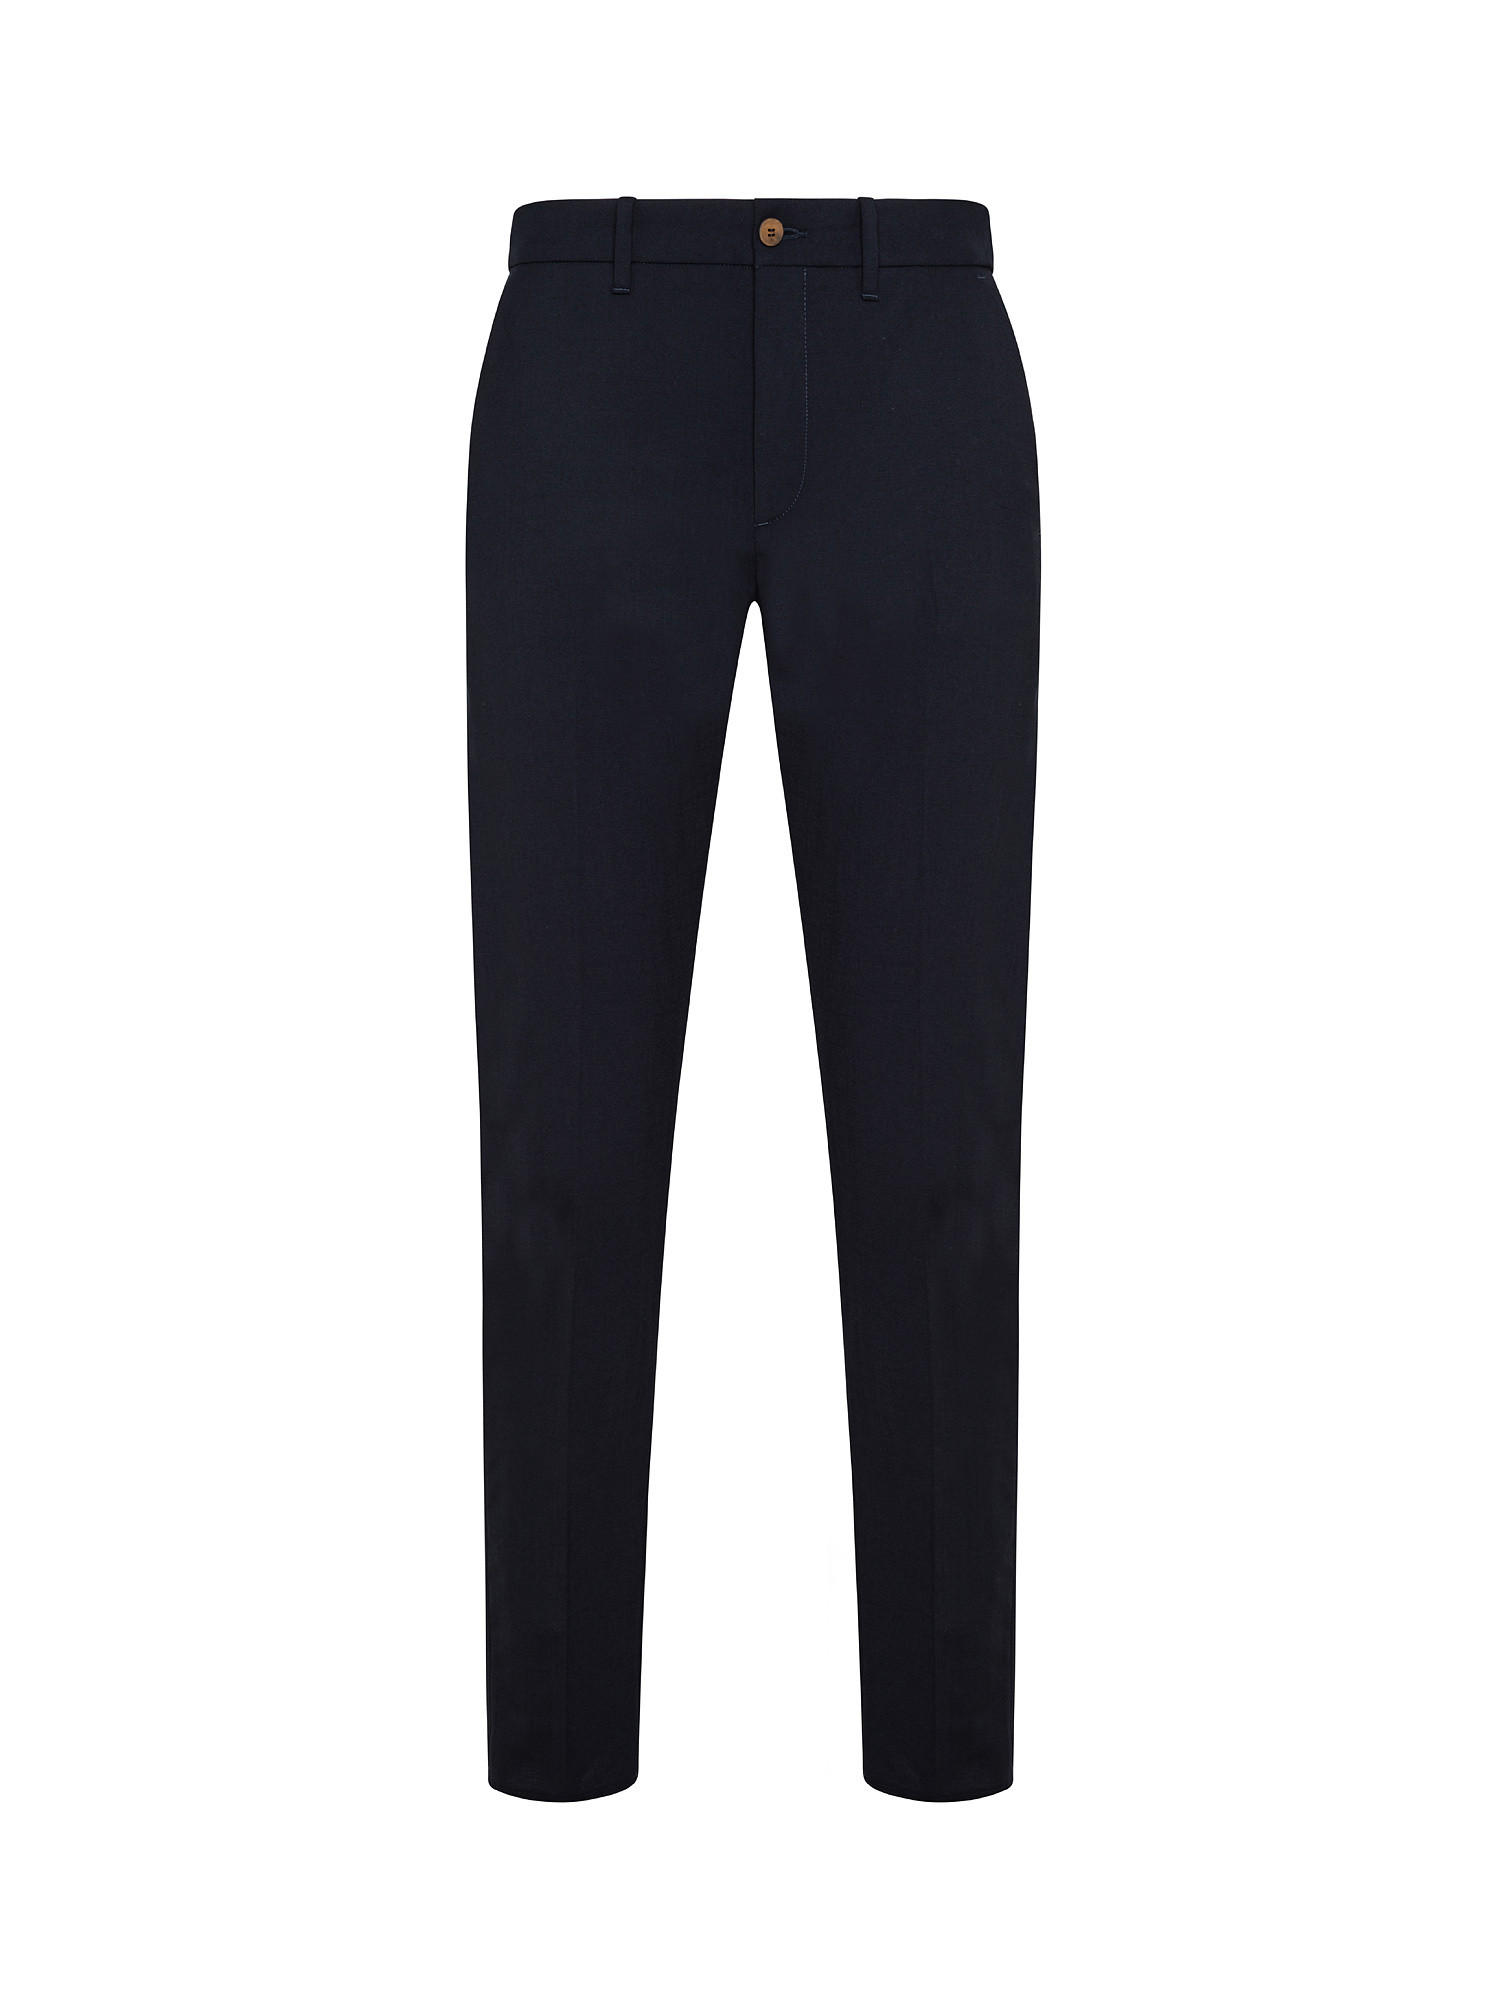 Pantaloni Chino coulisse, Blu scuro, large image number 0